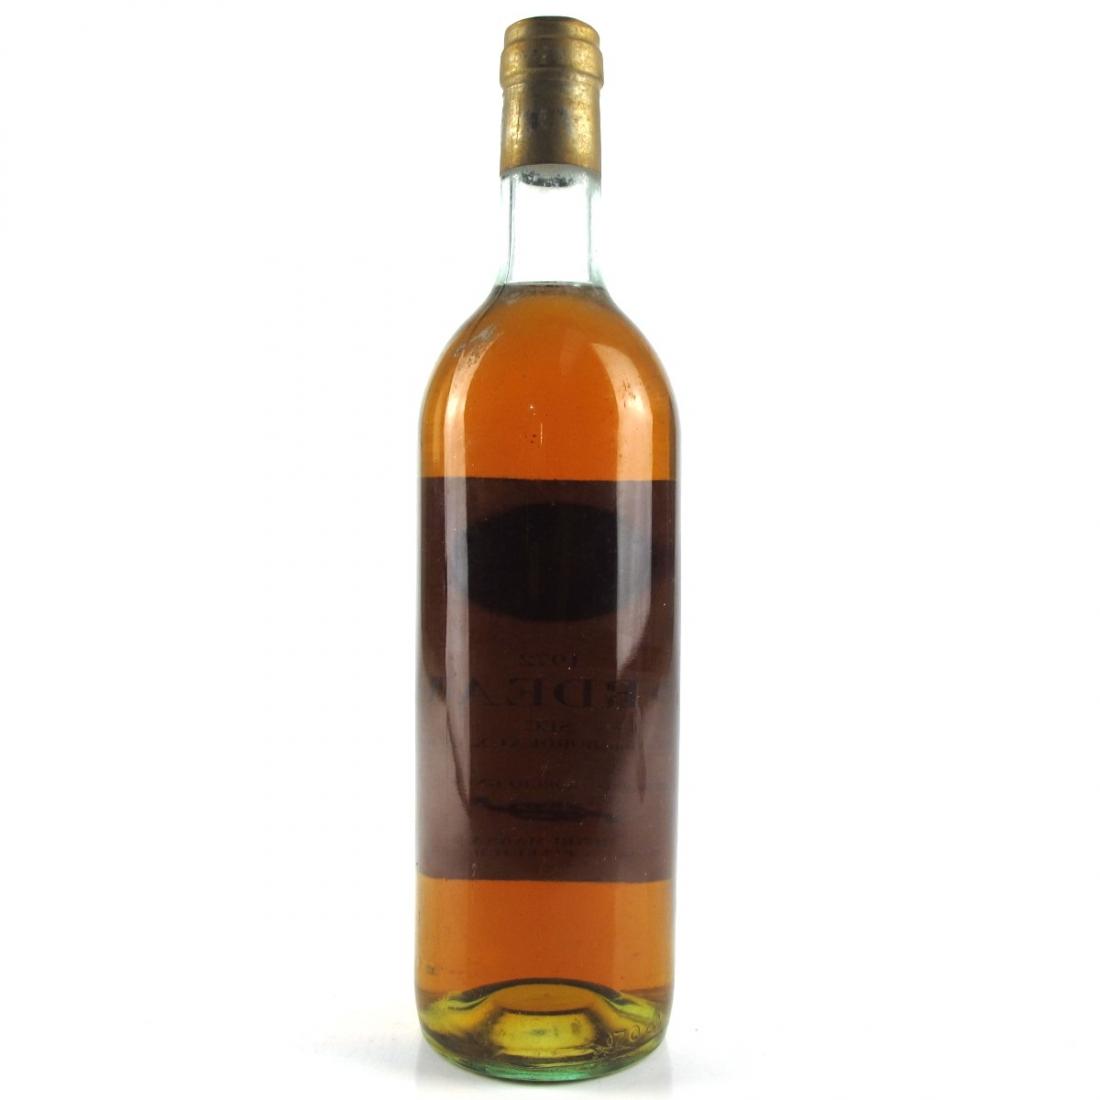 H.Marsal 1972 Bordeaux Blanc